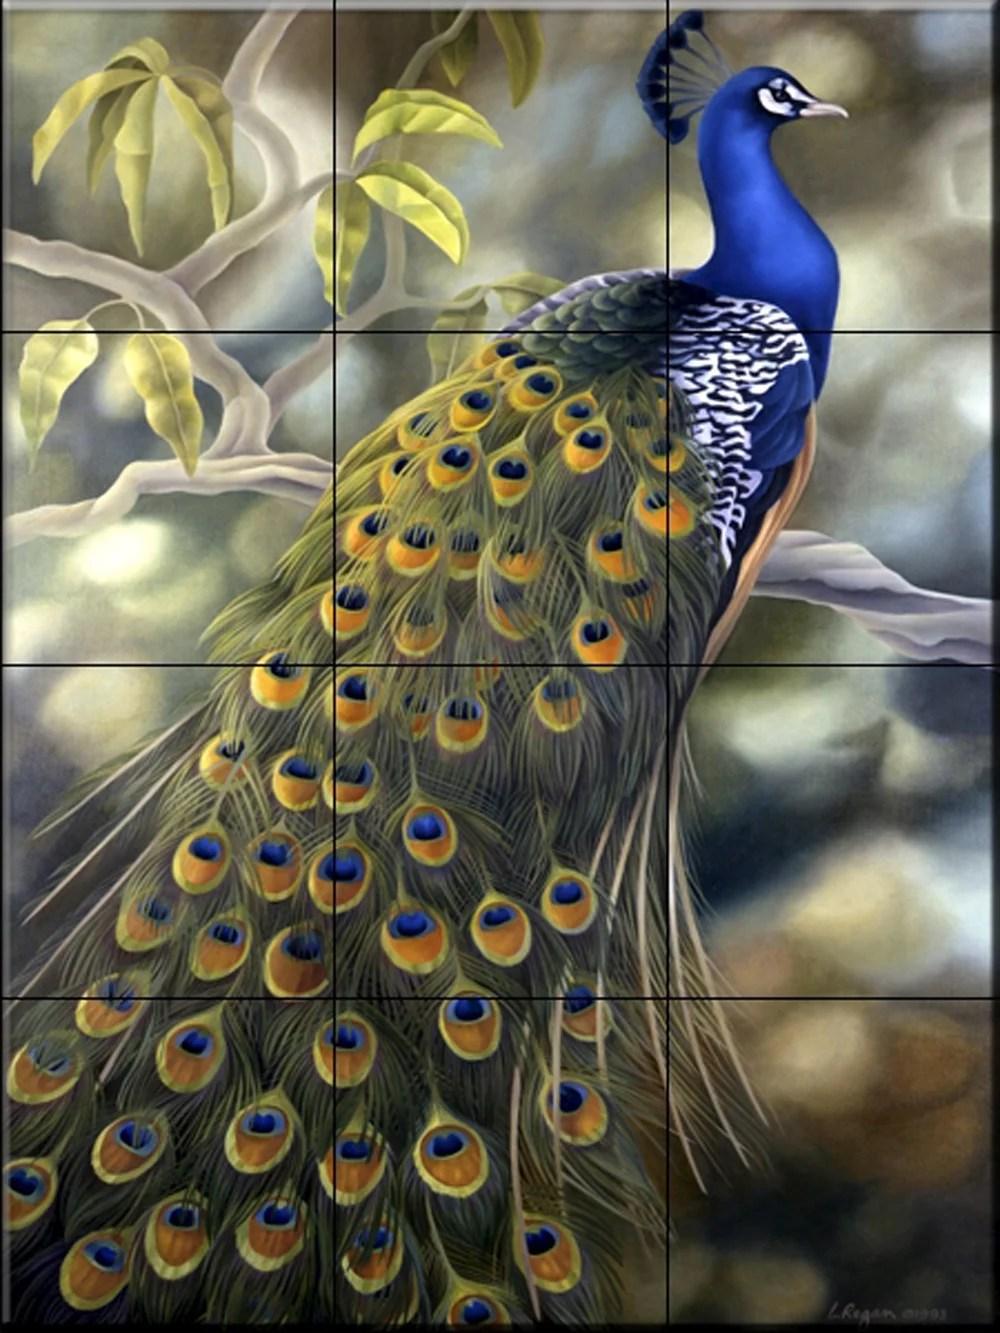 ceramic tile mural peacock by laura regan kitchen backsplash bathroom shower